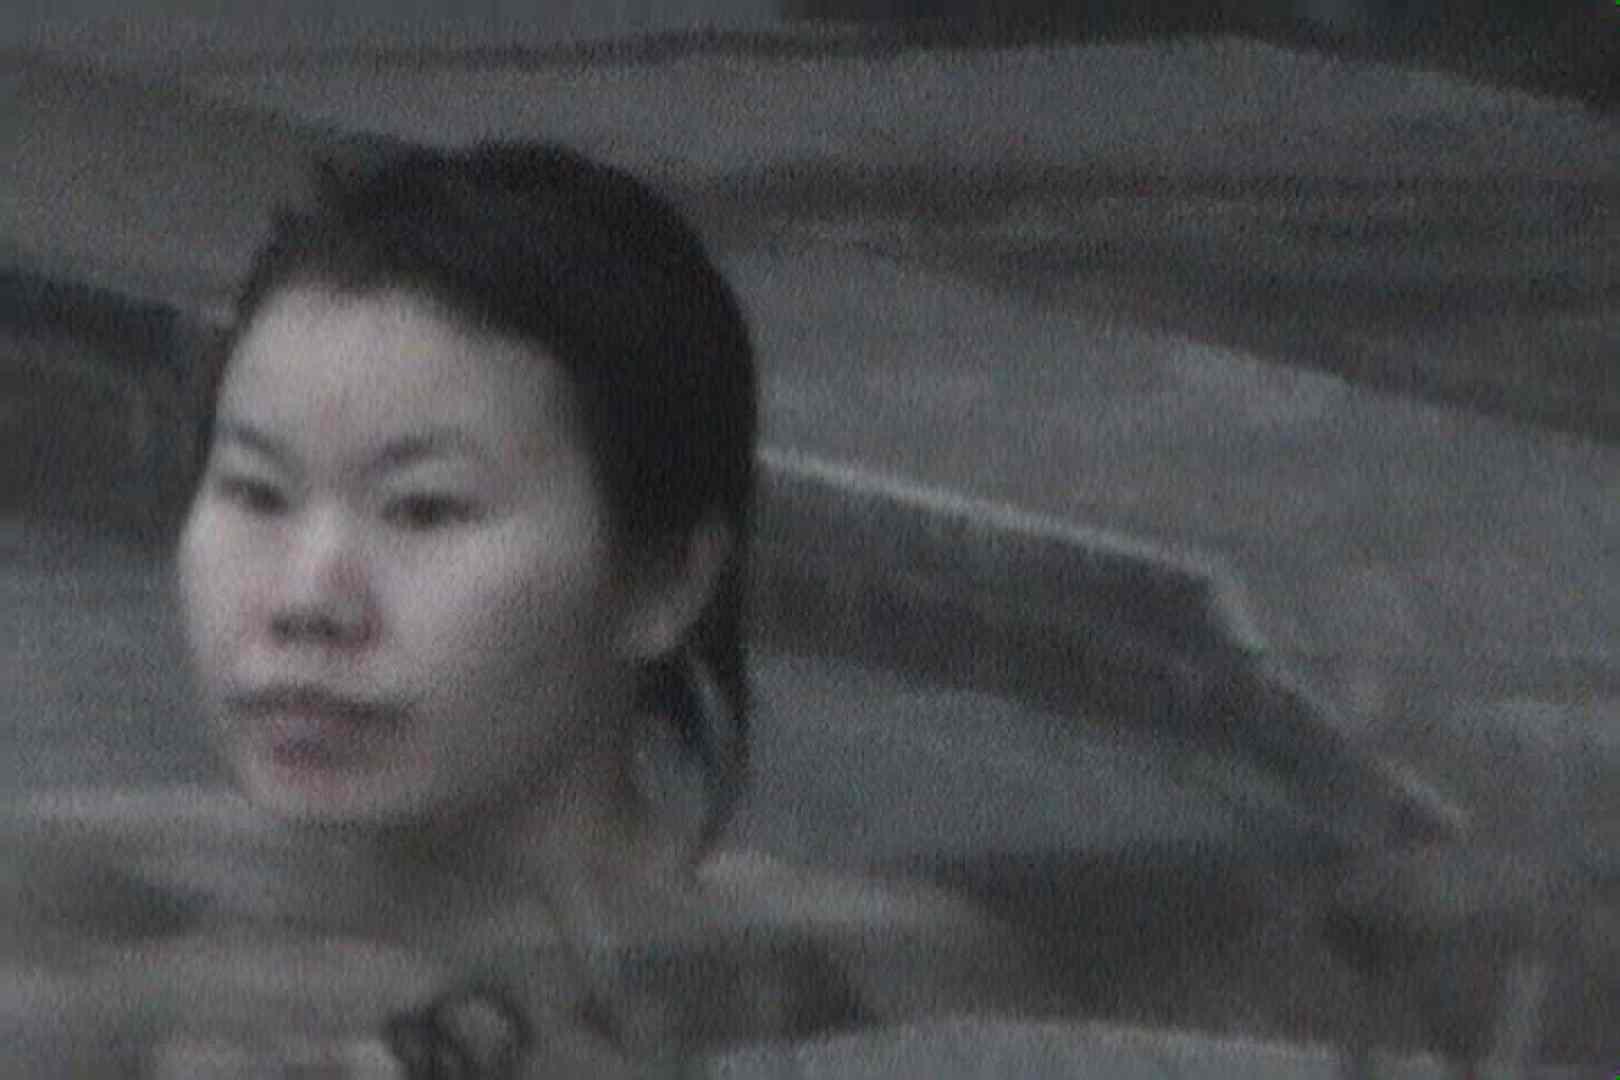 Aquaな露天風呂Vol.556 露天風呂編 | 盗撮シリーズ  99PIX 19